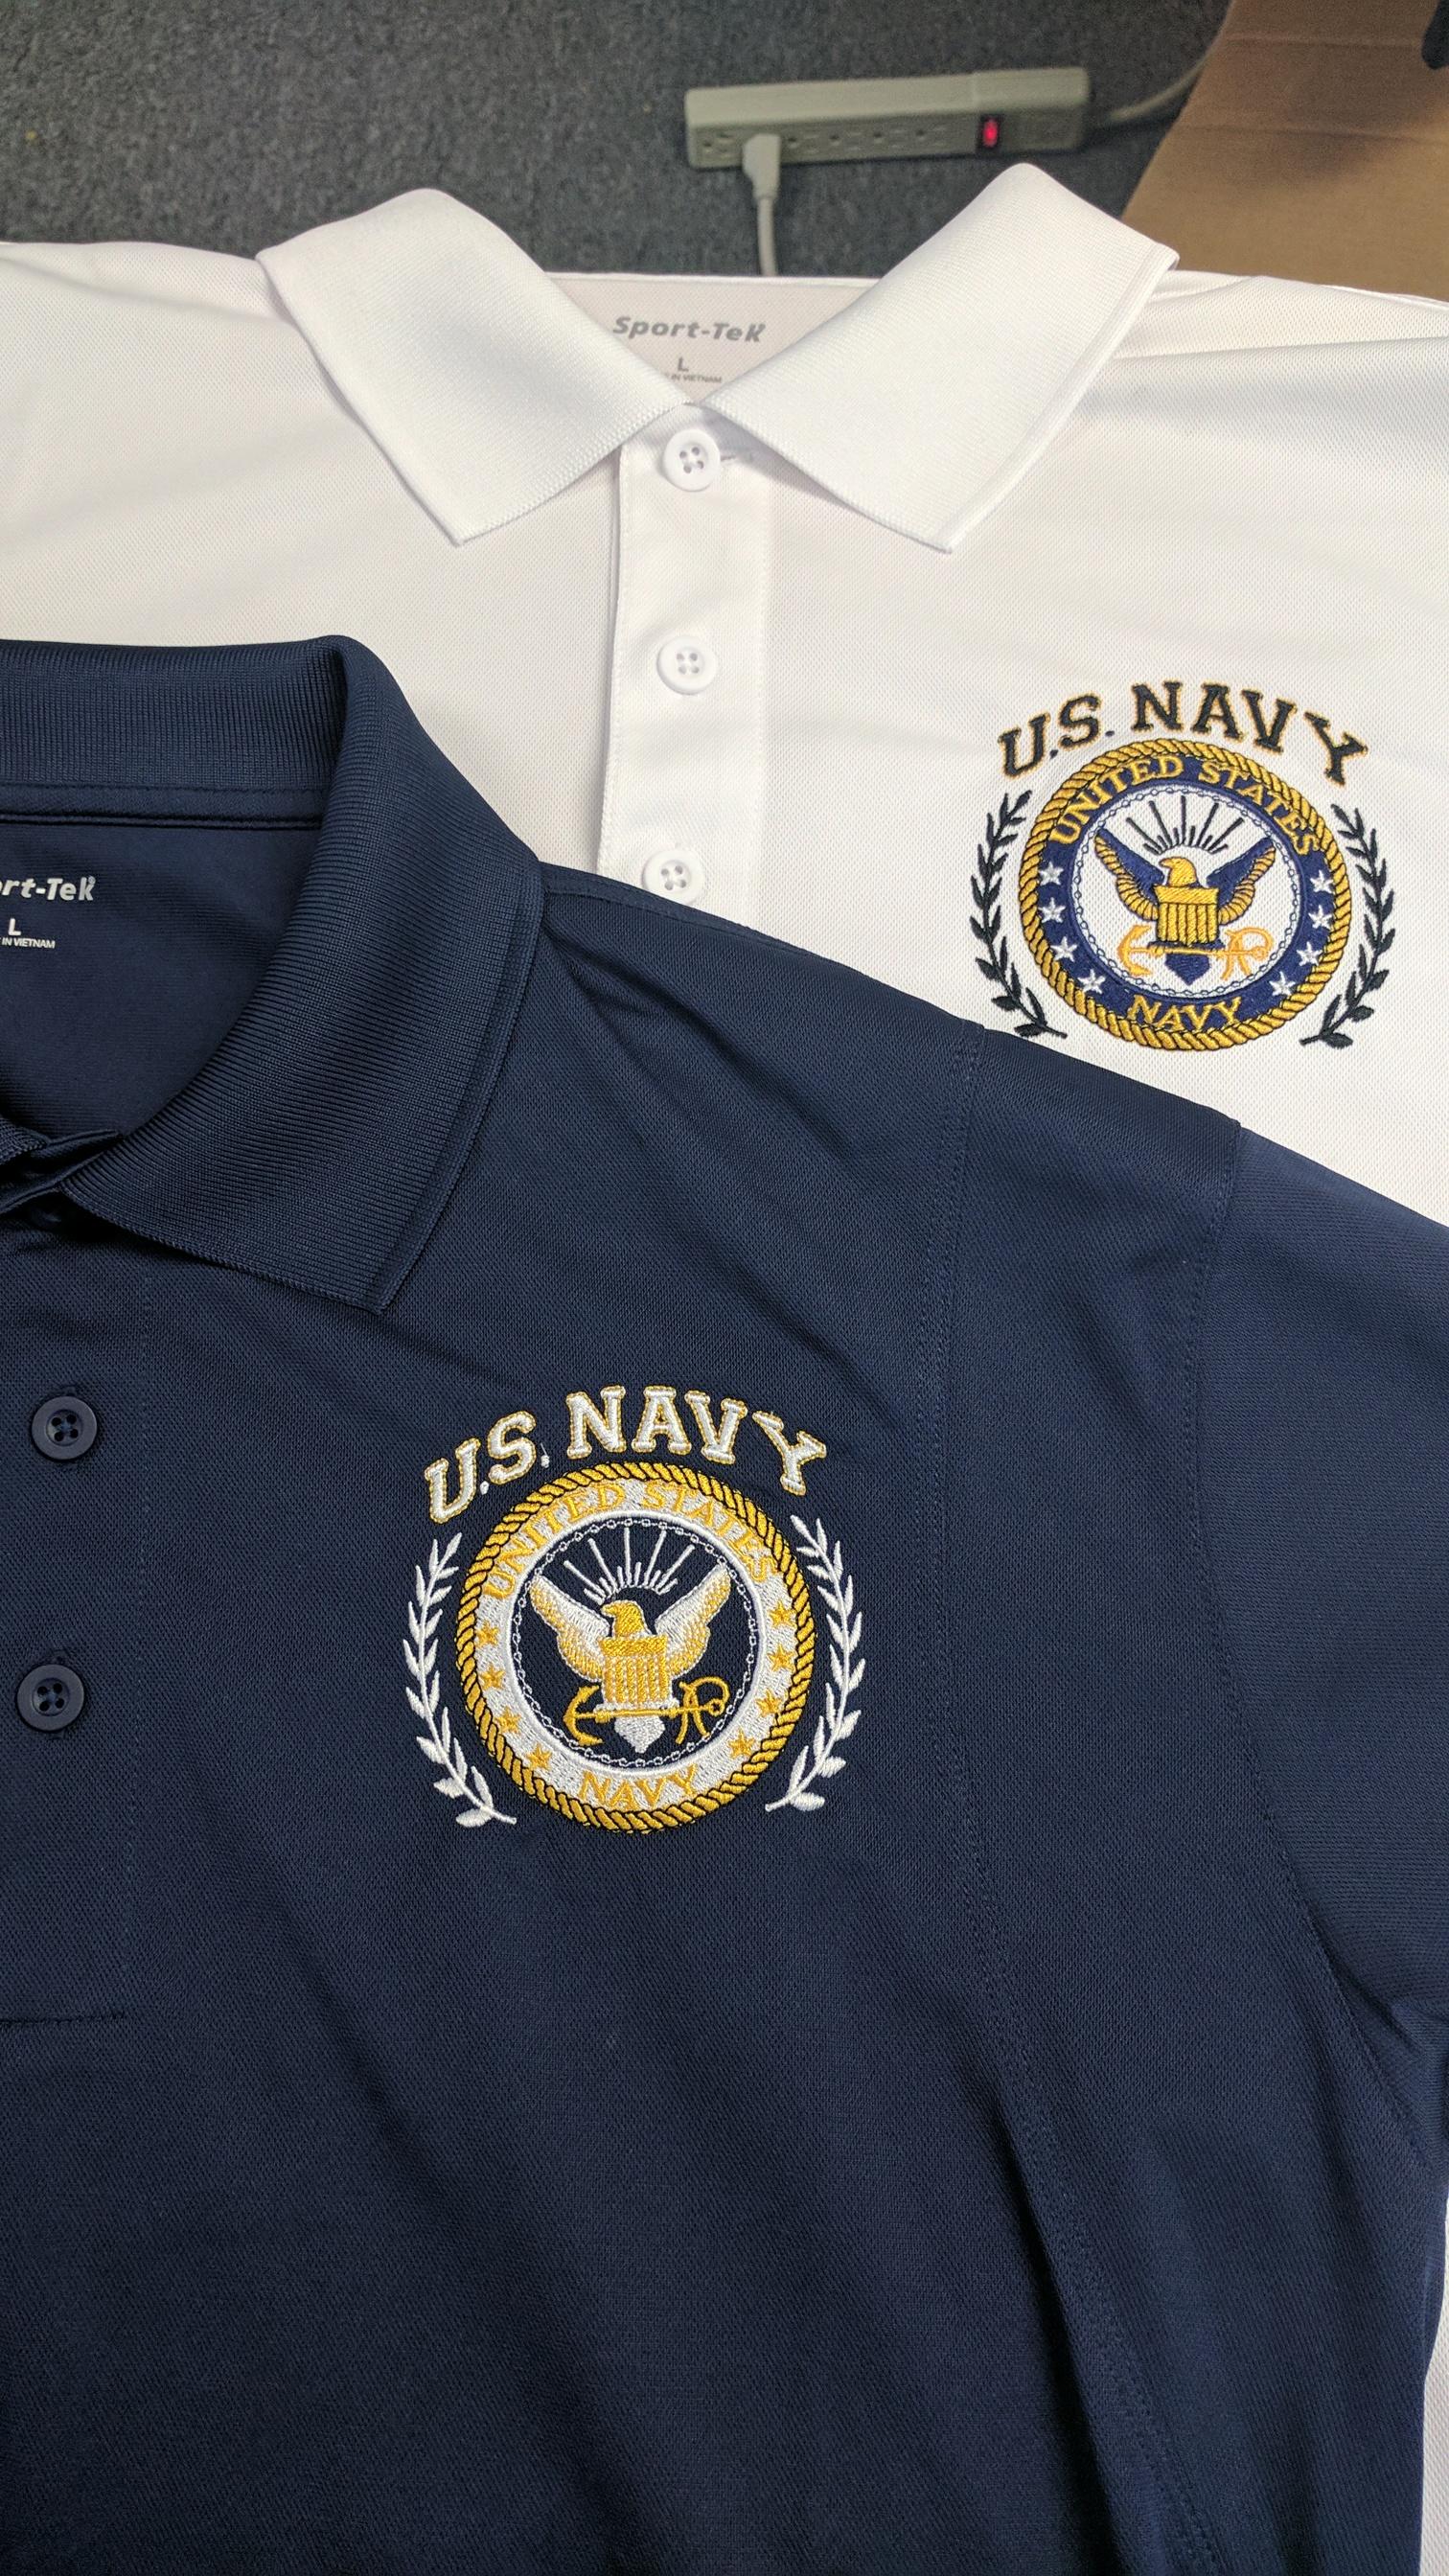 Navy Logo On Sport Tek Shirts Hines Screen Printing Embroidery